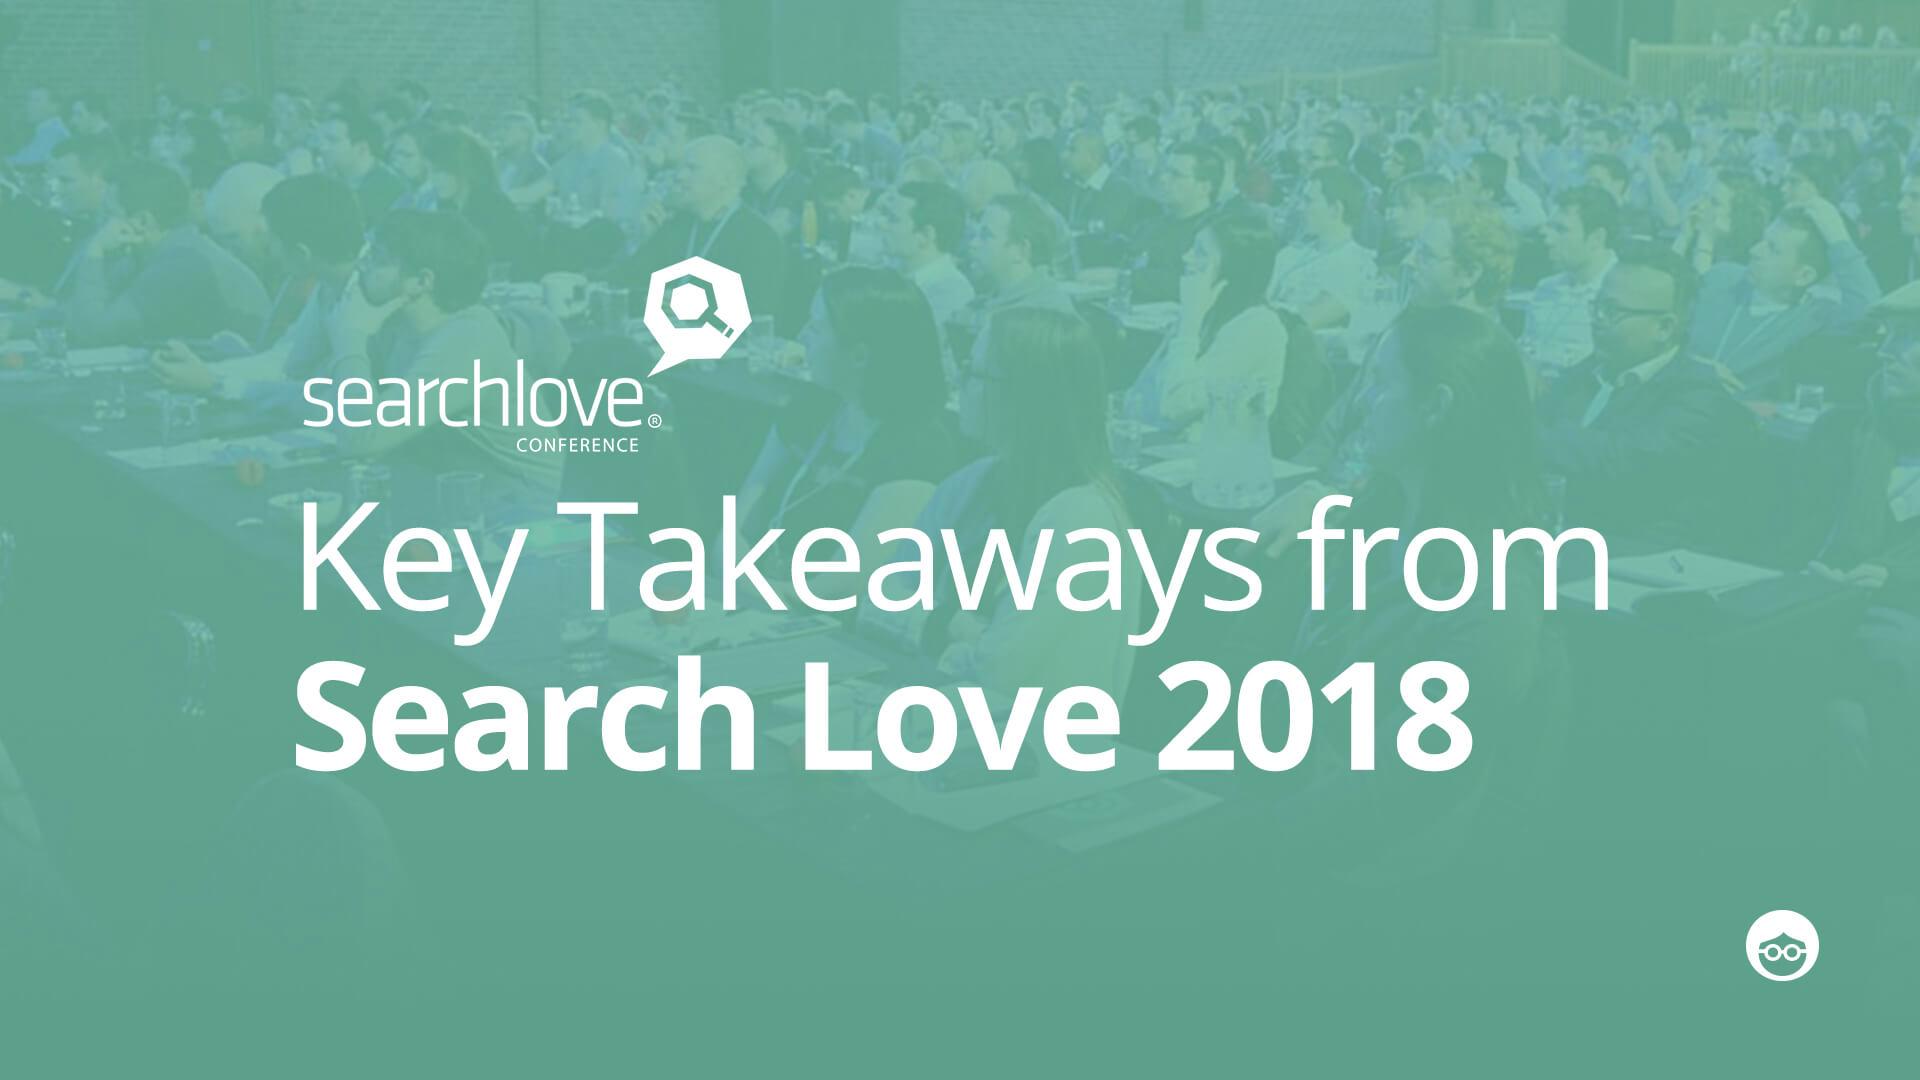 SearchLove 2018 recap